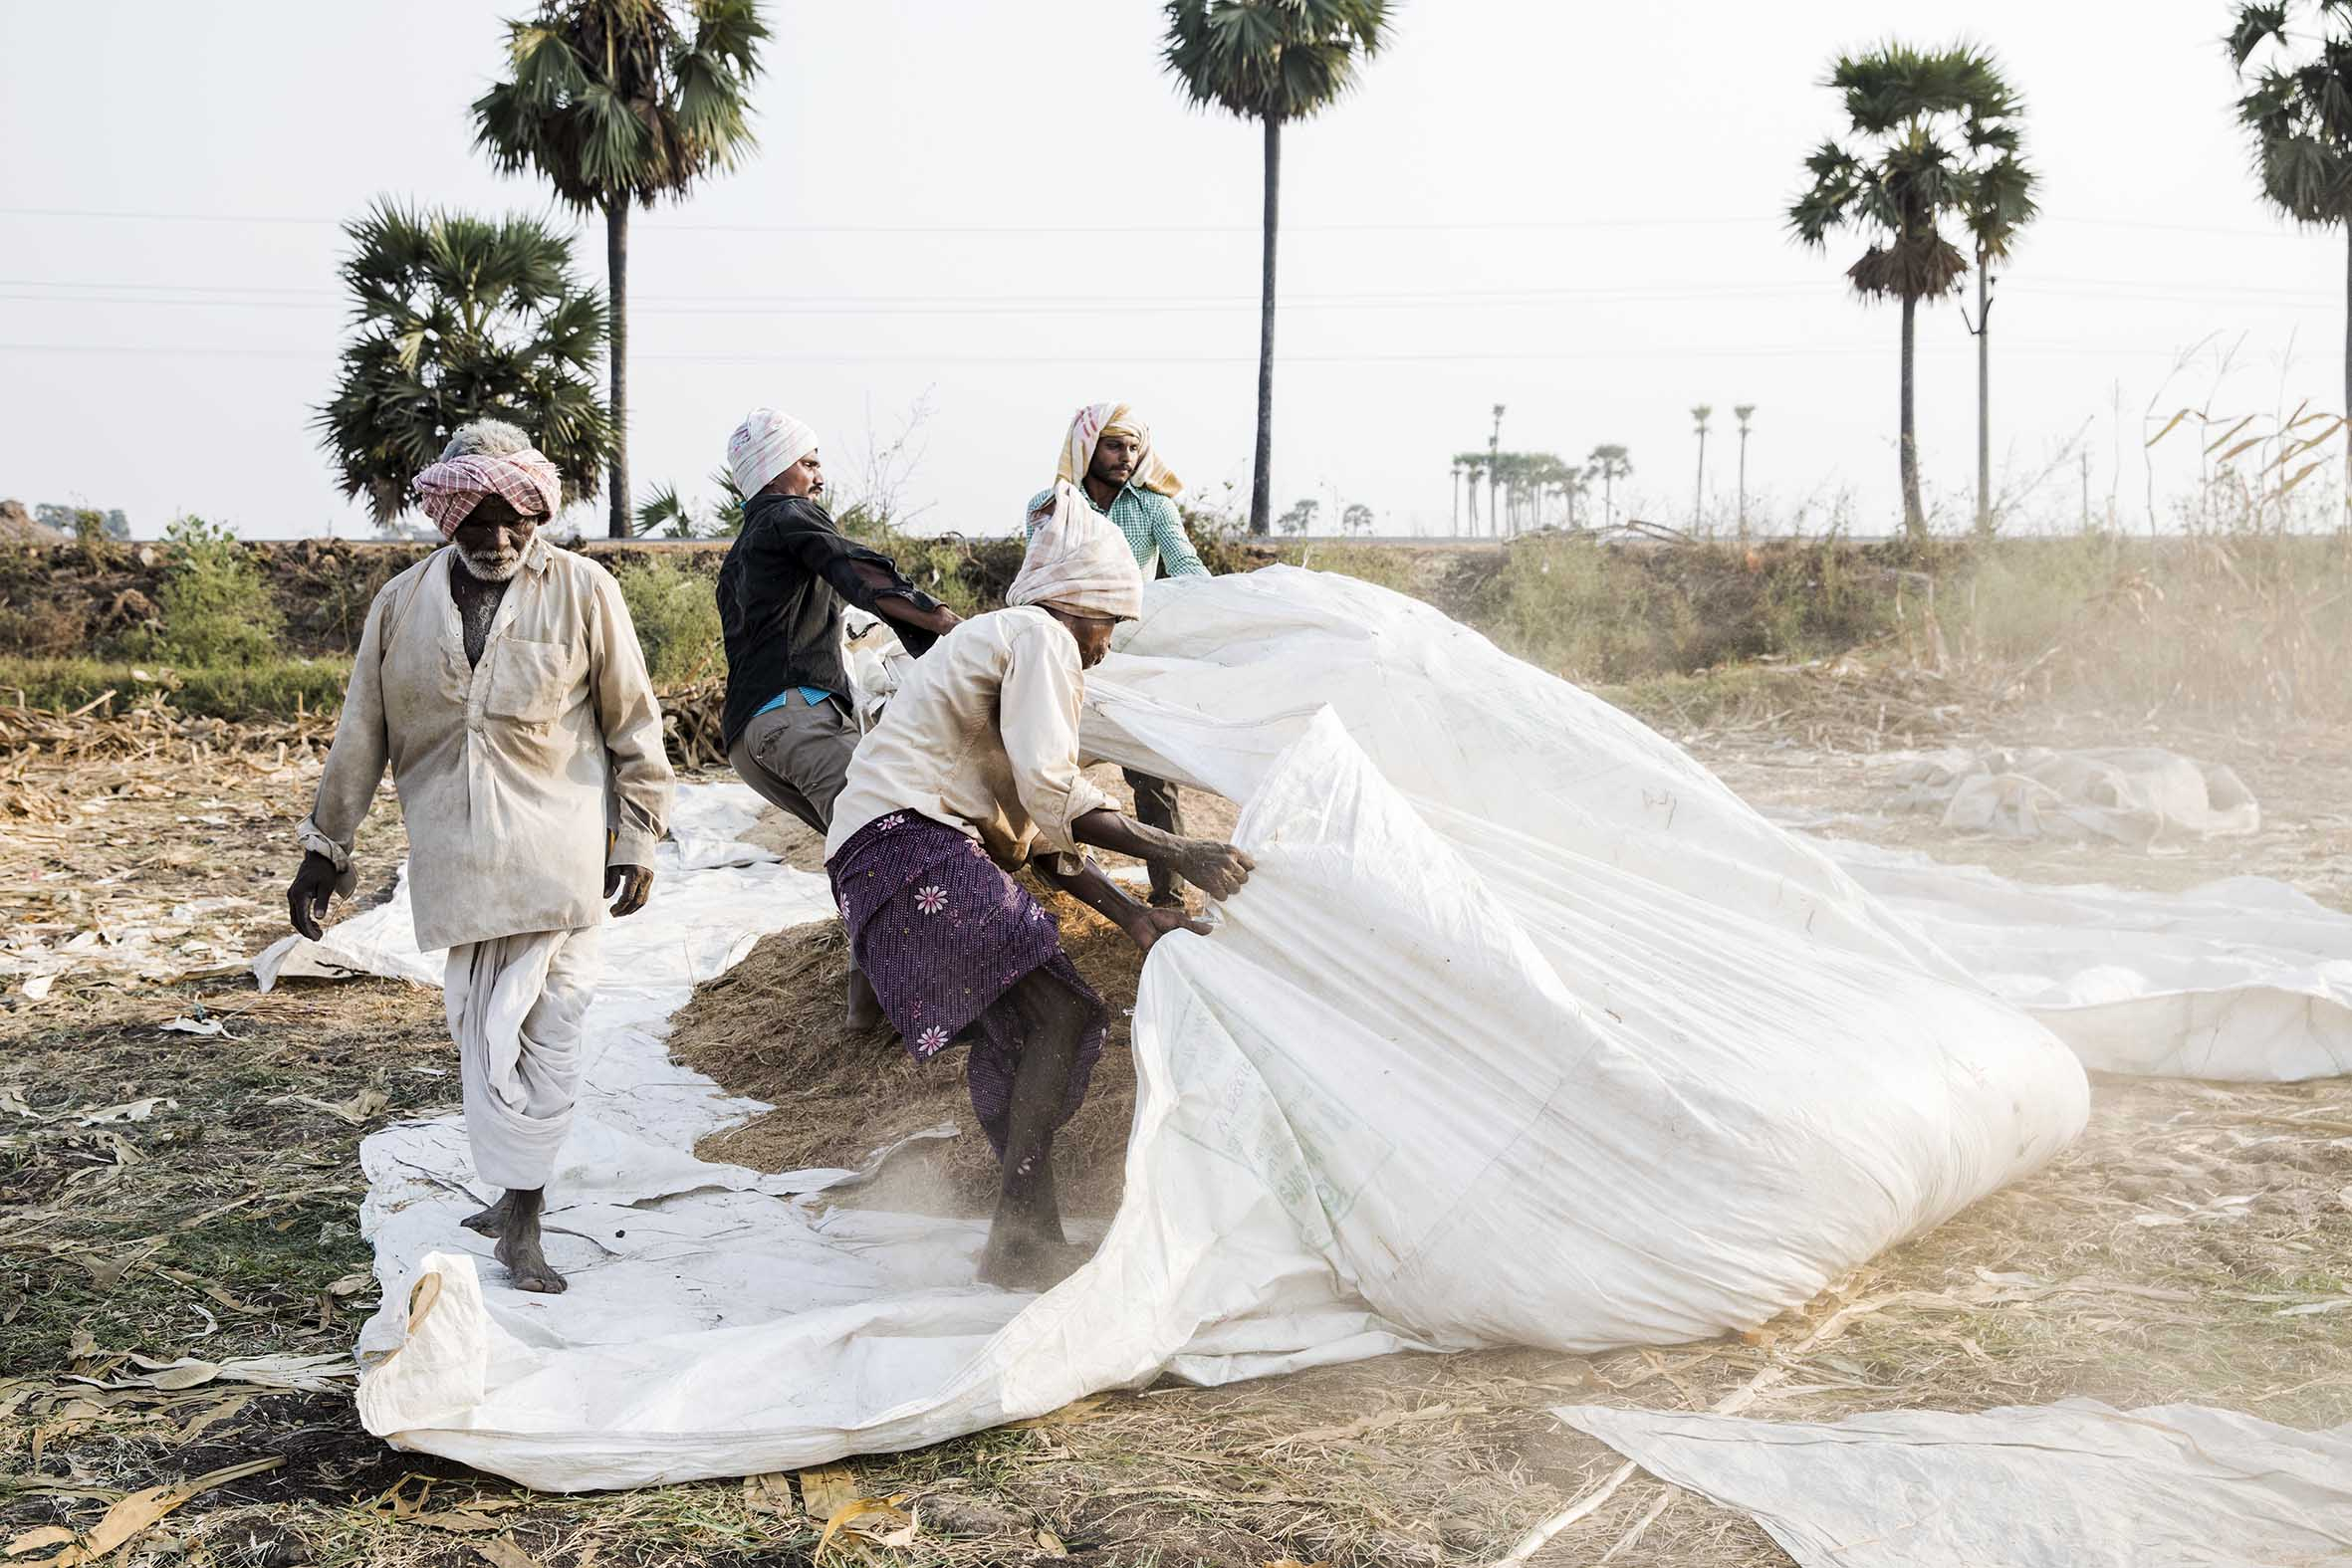 Leven in India Rianne Veldman11